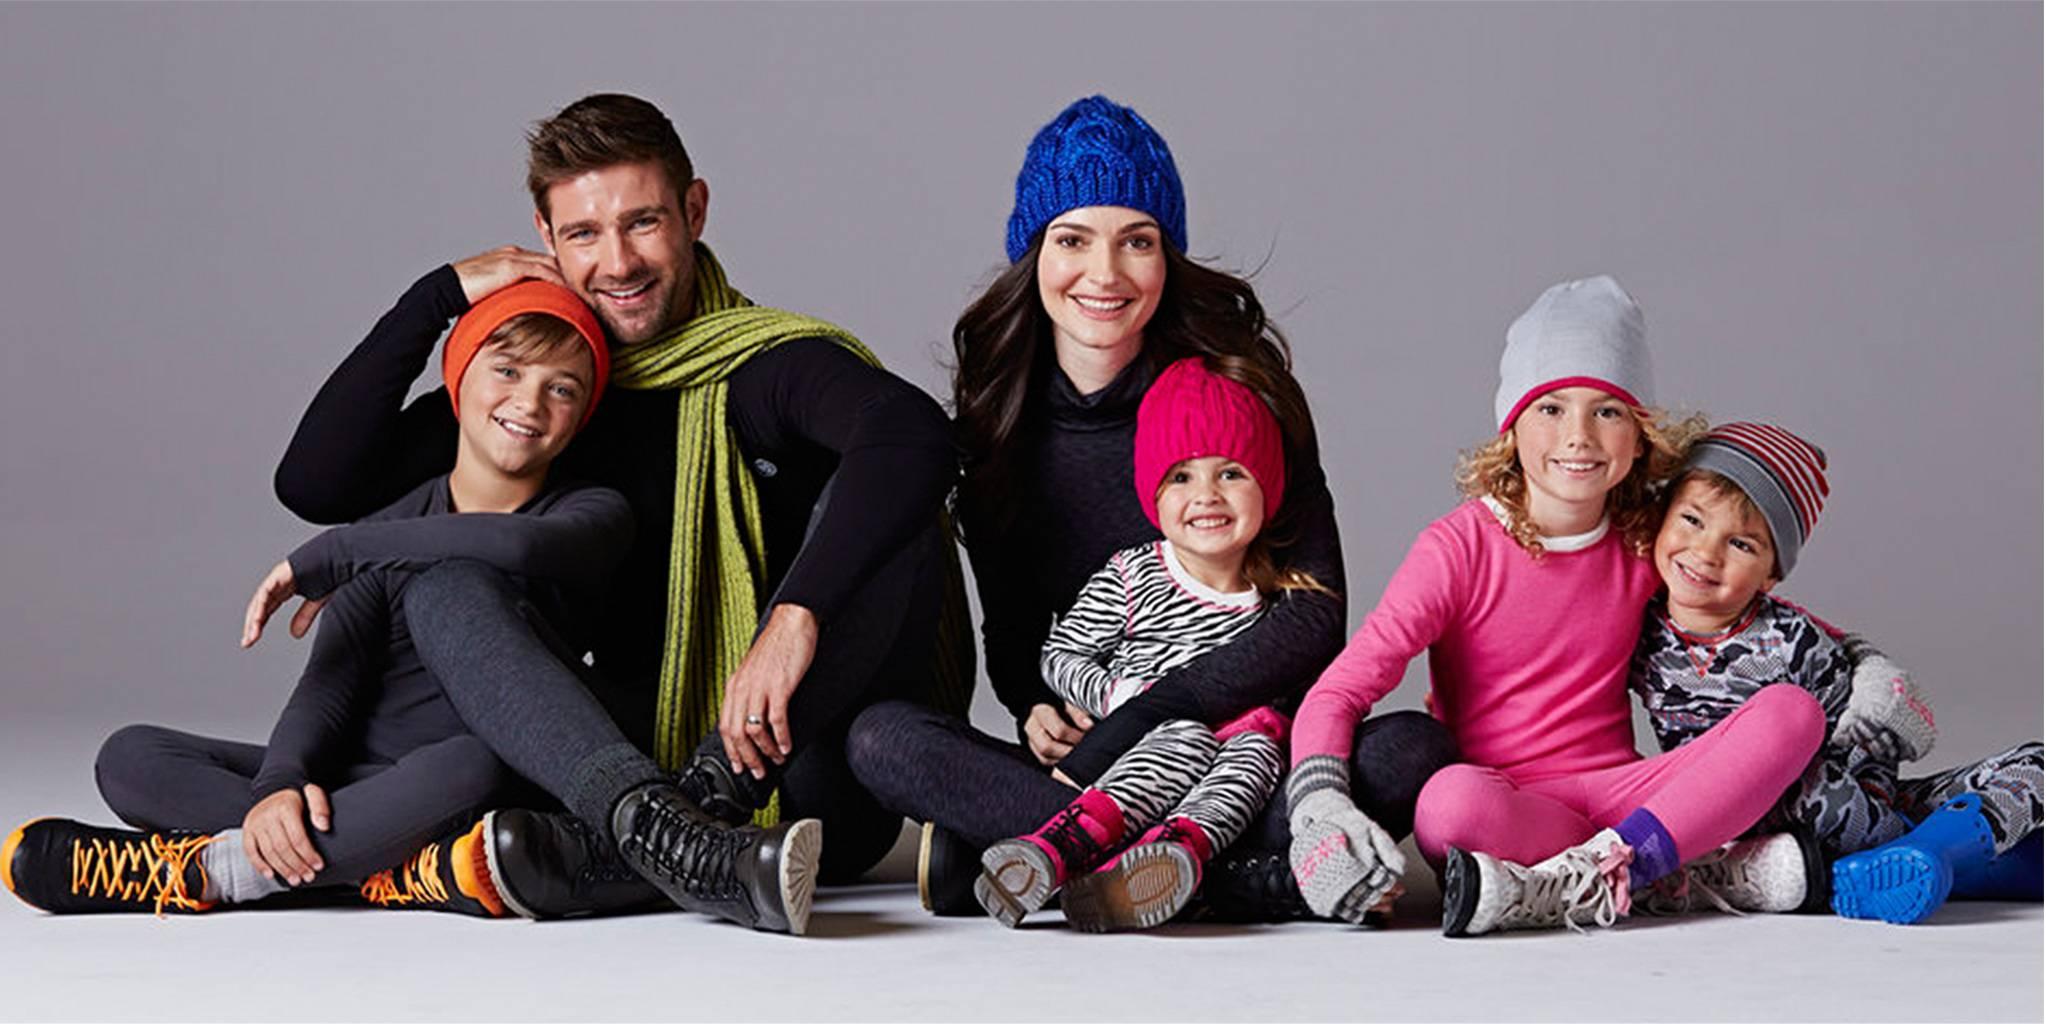 проводнике слева фото семьи реклама обуви легкое